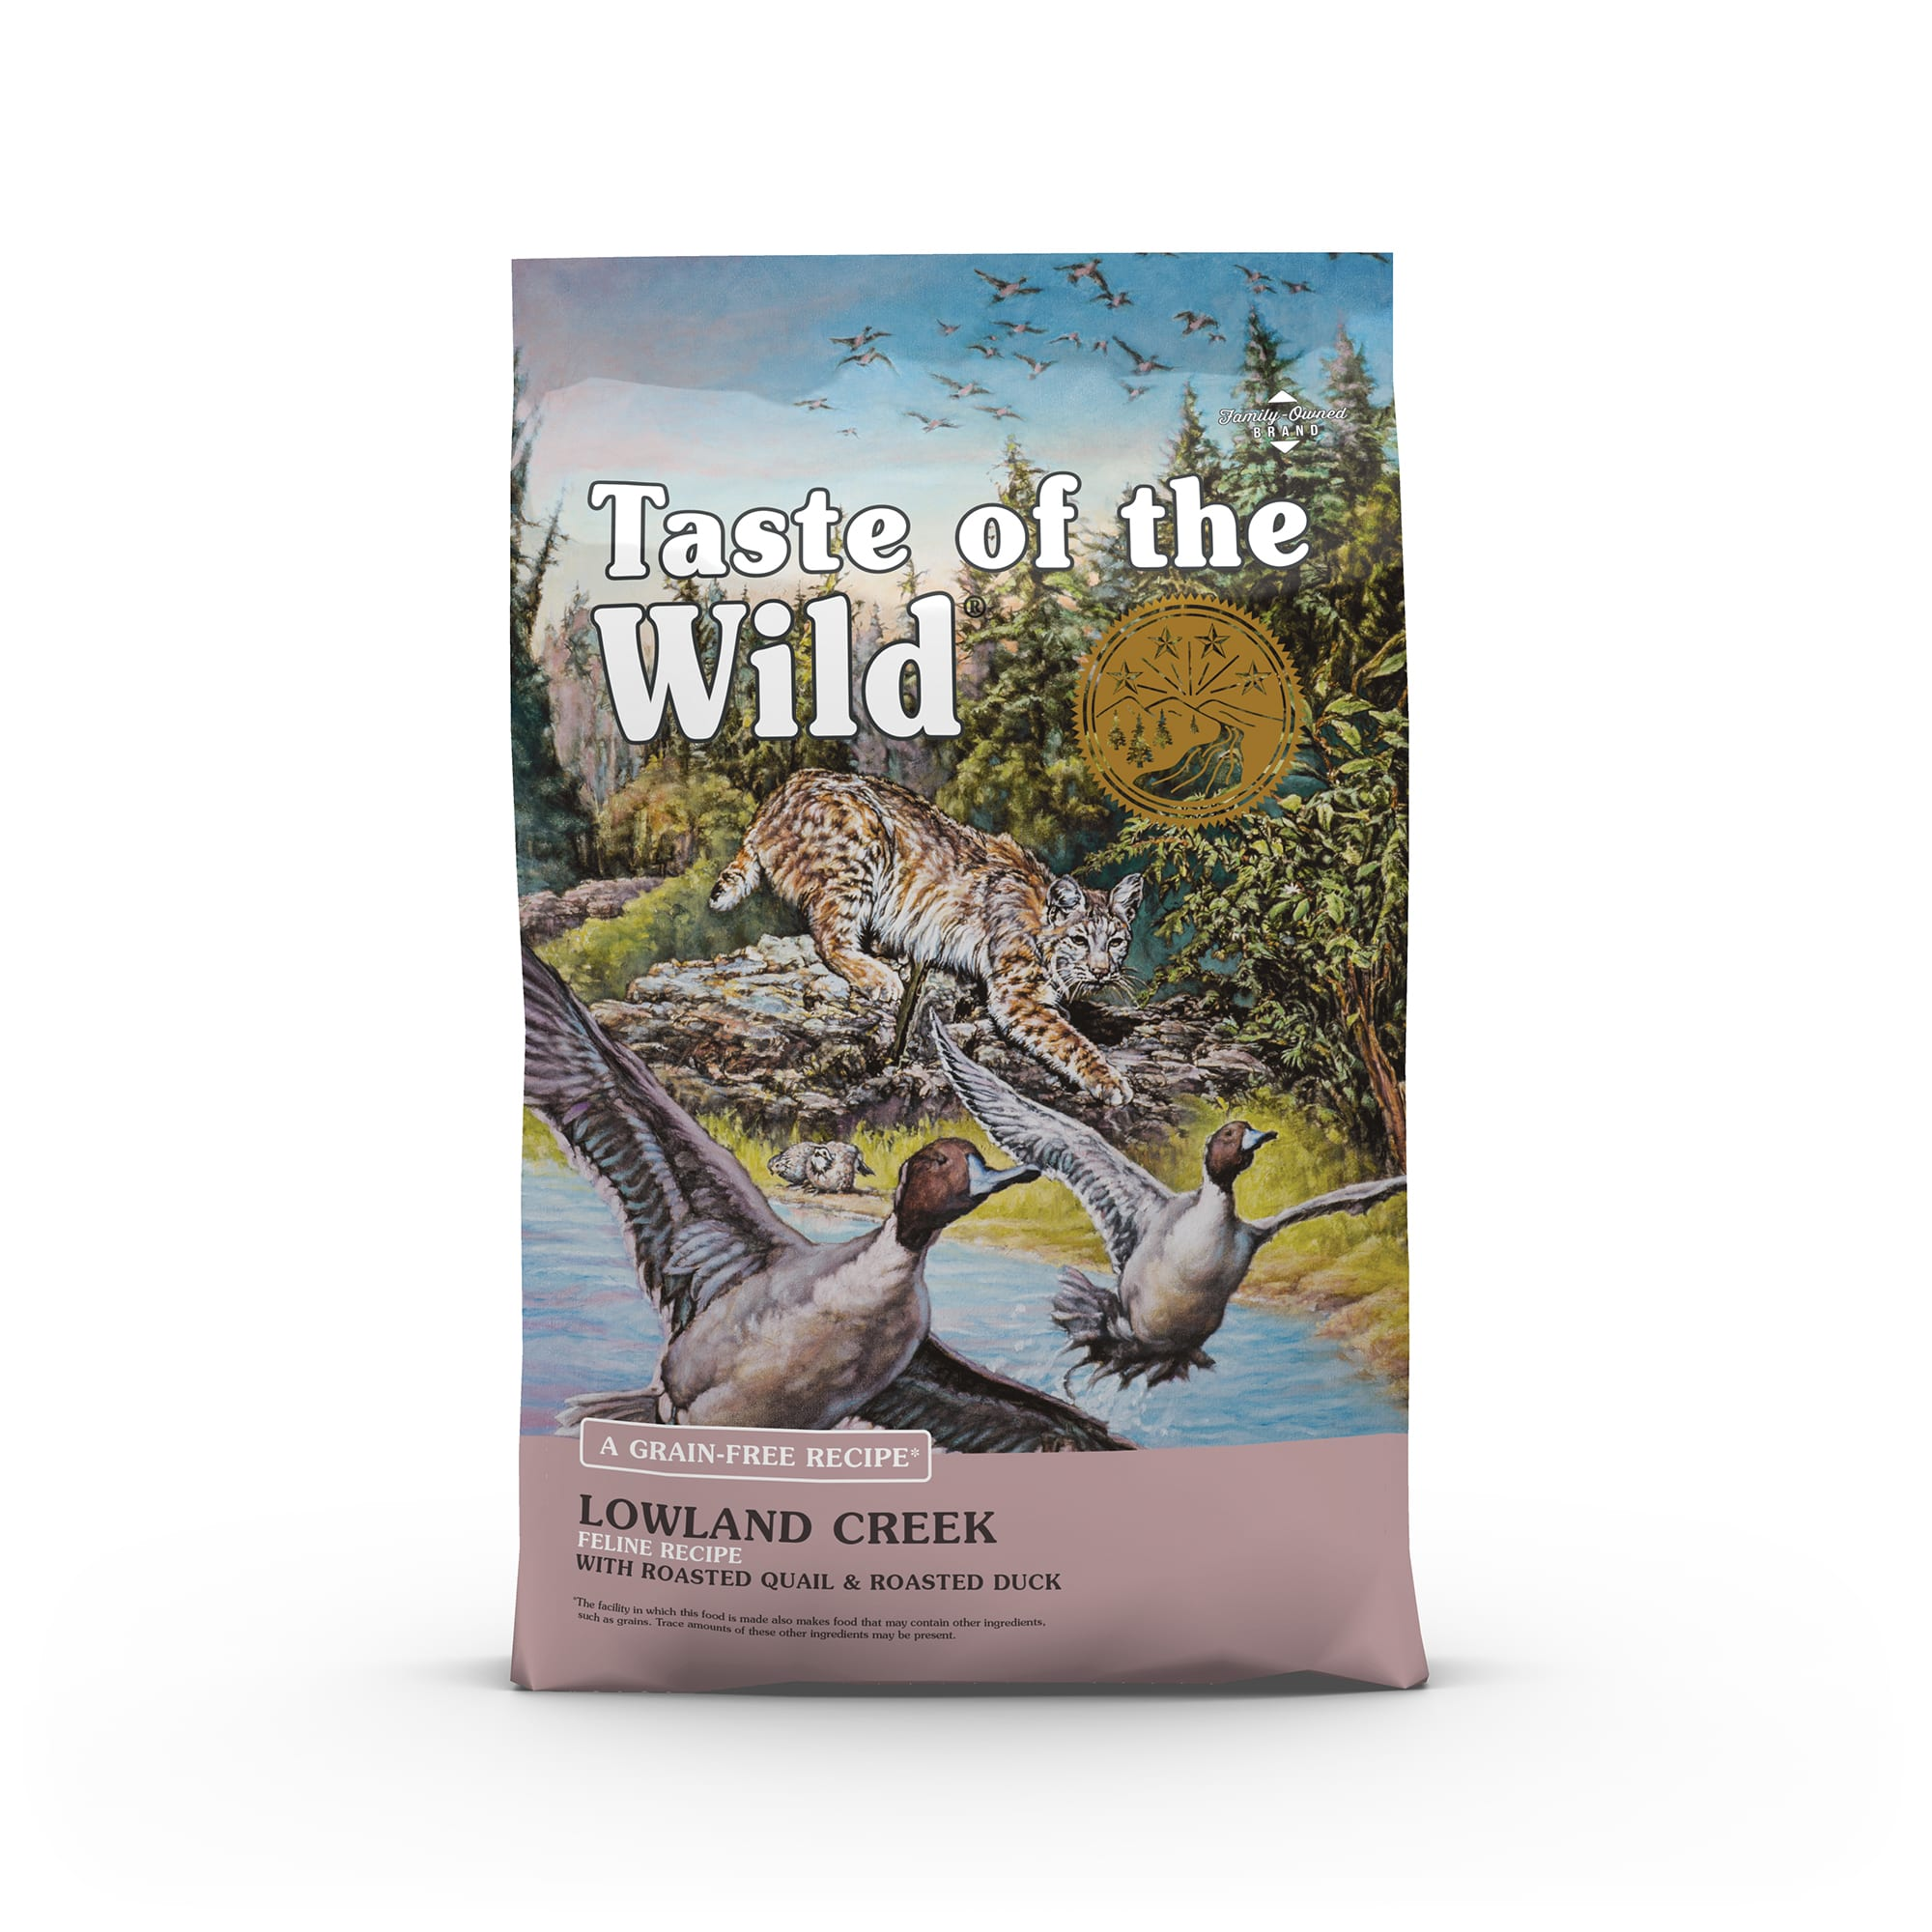 Taste of the Wild Lowland Creek Grain-Free Roasted Quail & Roasted Duck Dry Cat Food, 14 lbs ...